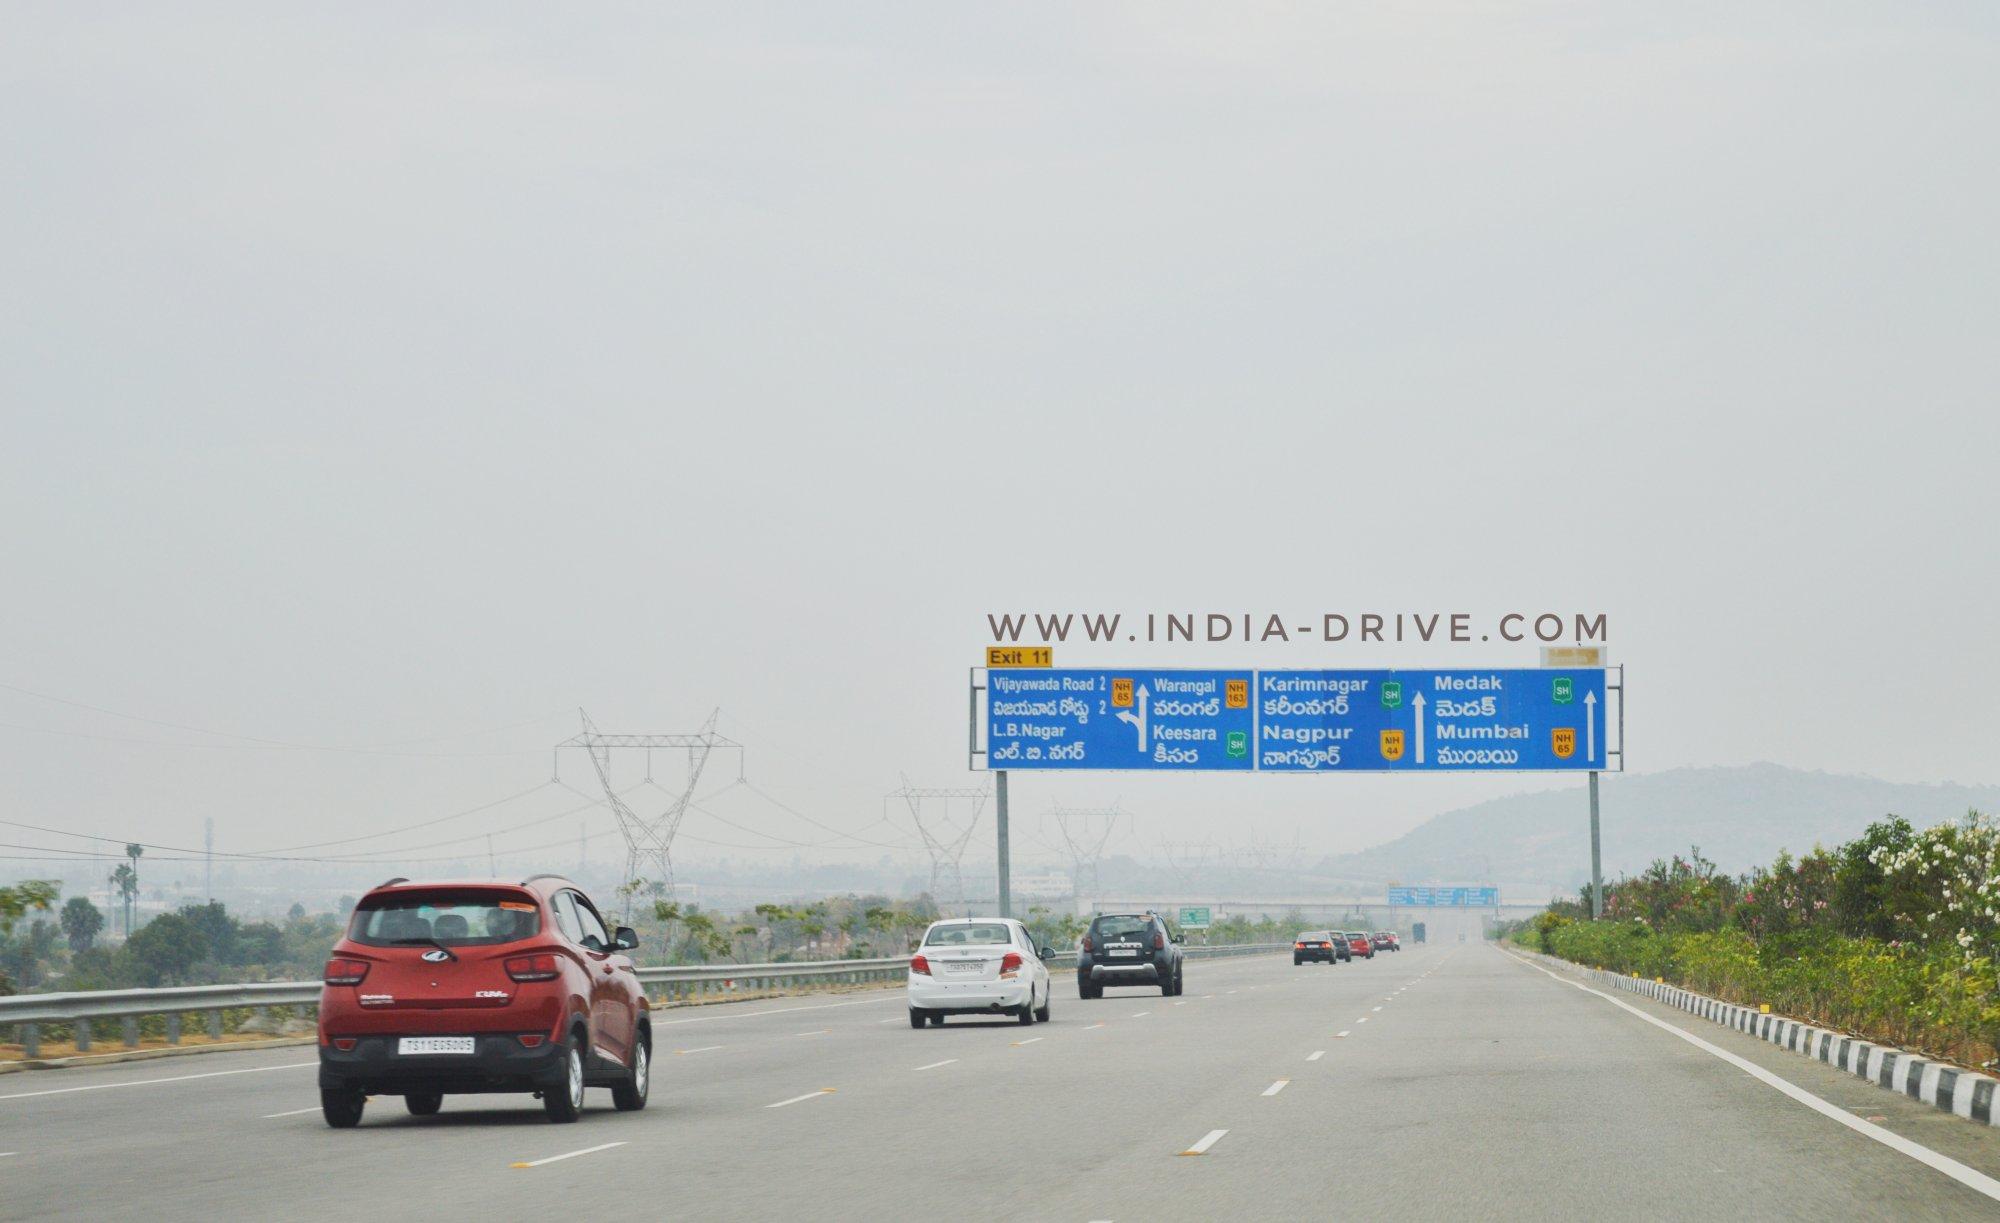 Hyderabad to Rachakonda fort, Republic day breakfast drive report - 26-01-2017